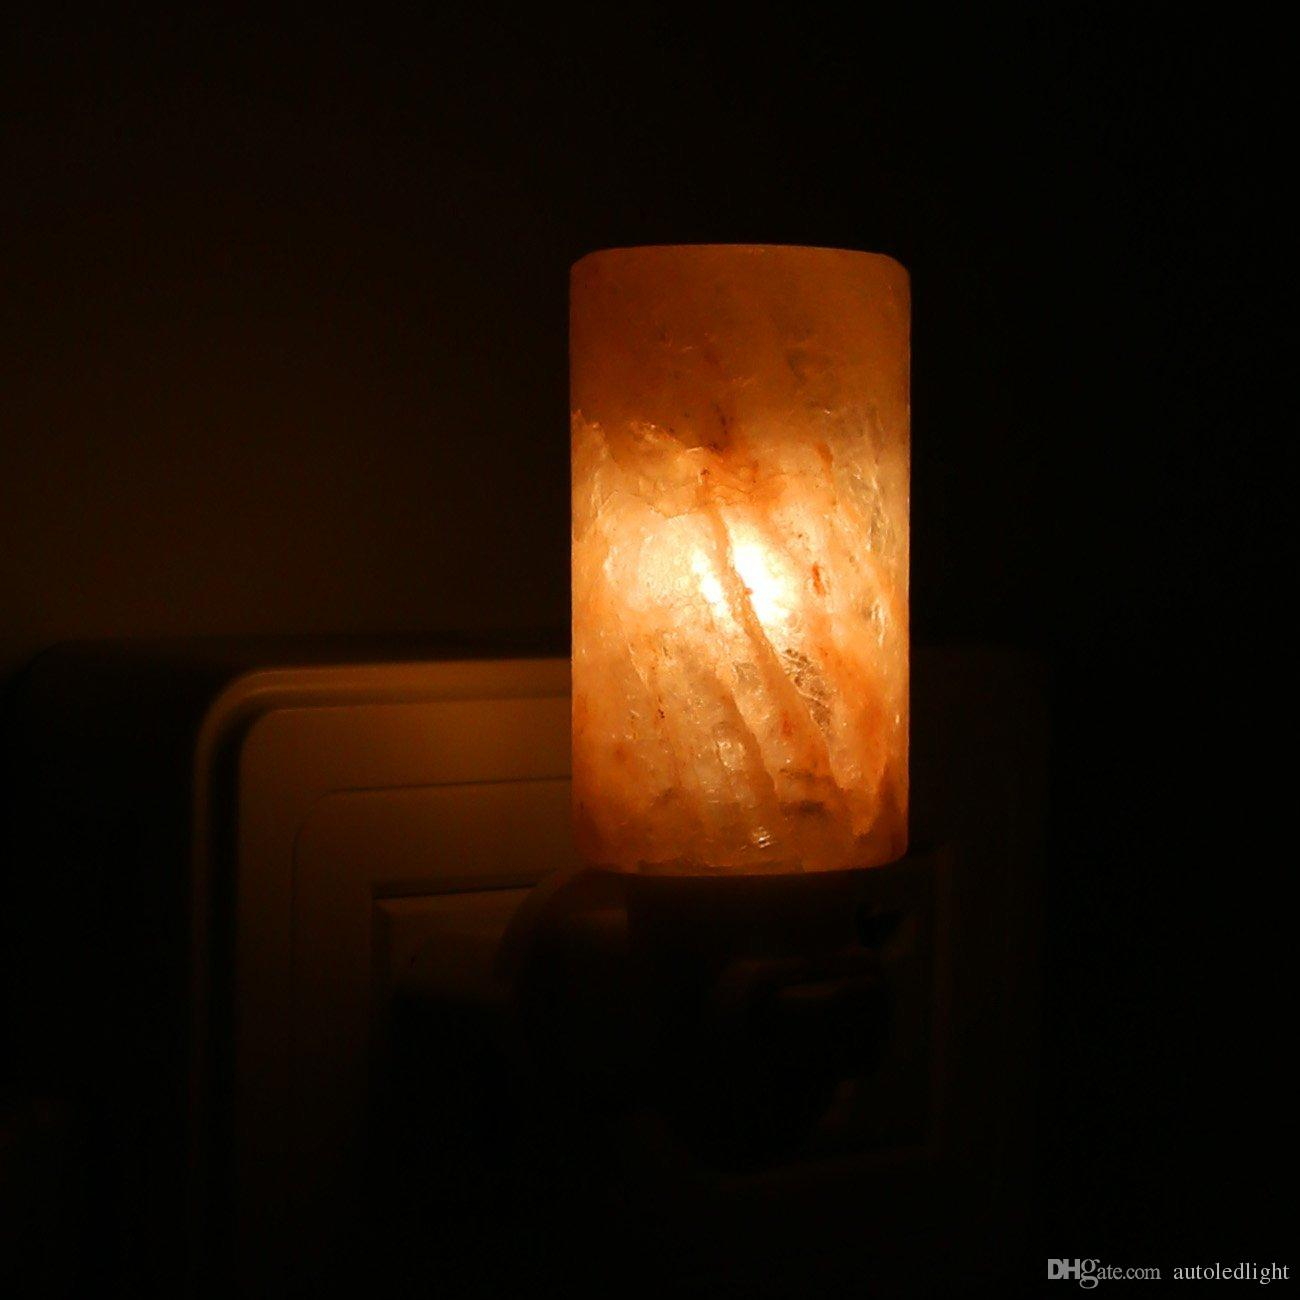 New Natural Himalayan Salt Led Night Light Décoratif Purificateur D'air Lampes Murales Cylindre Nursery Lampe Cristal Lampe US / EU / AU / UK Plug